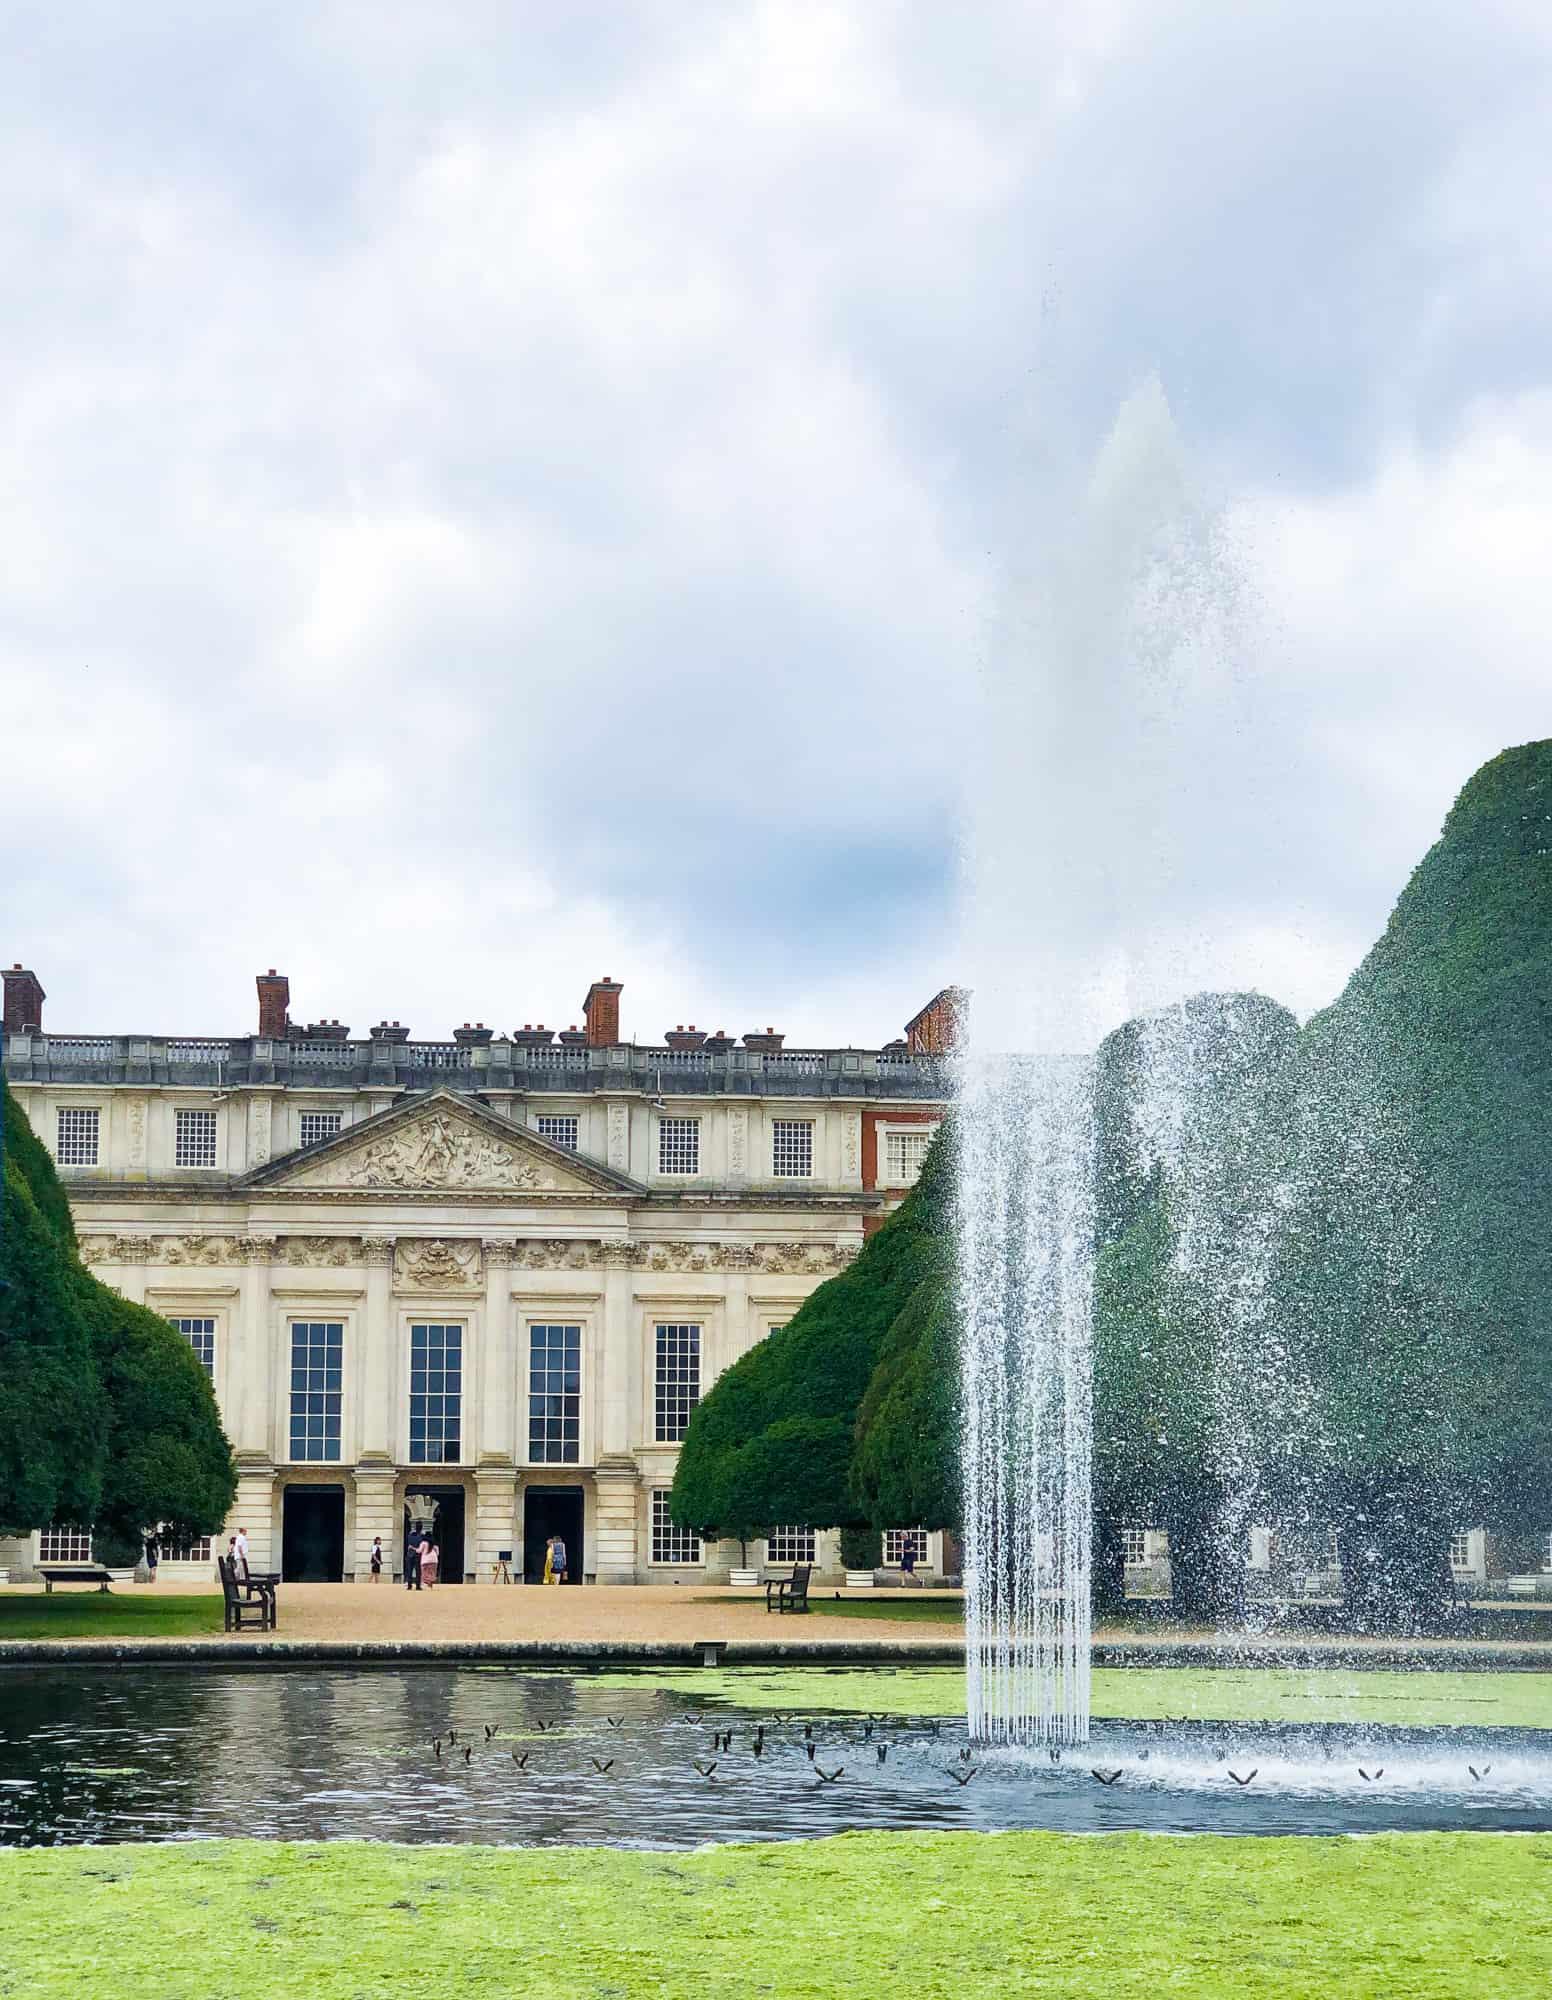 England - Hampton Court Palace Gardens and Fountain